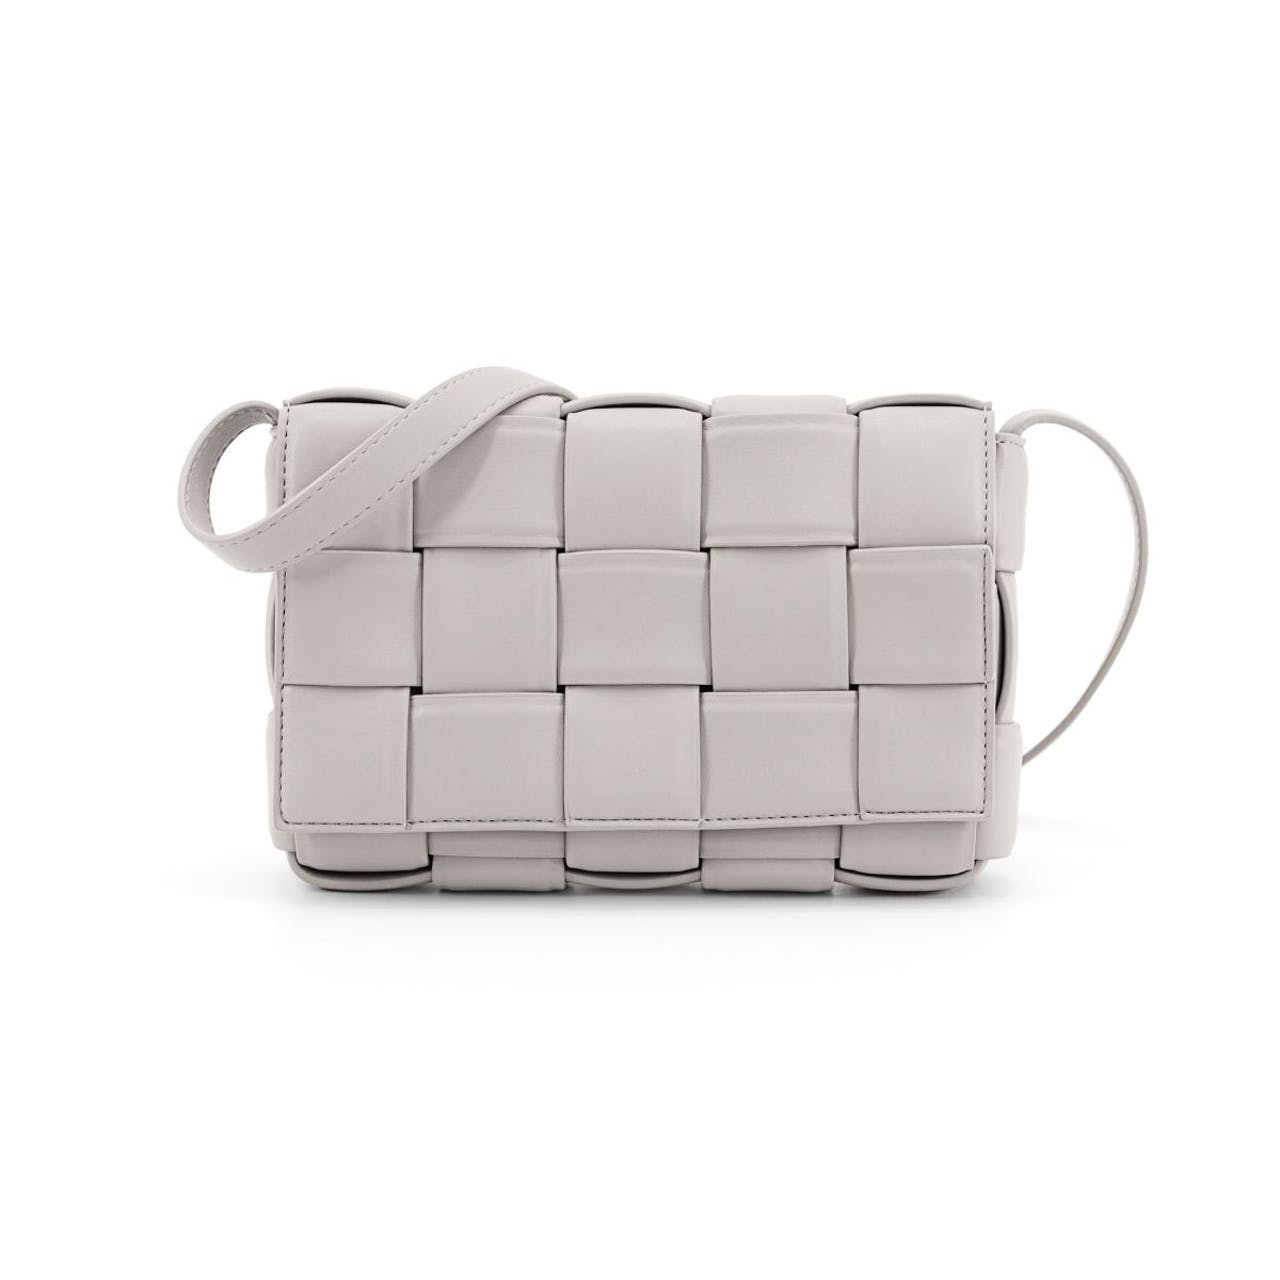 Tipperary Crystal Lyon Weave Grey Crossbody side